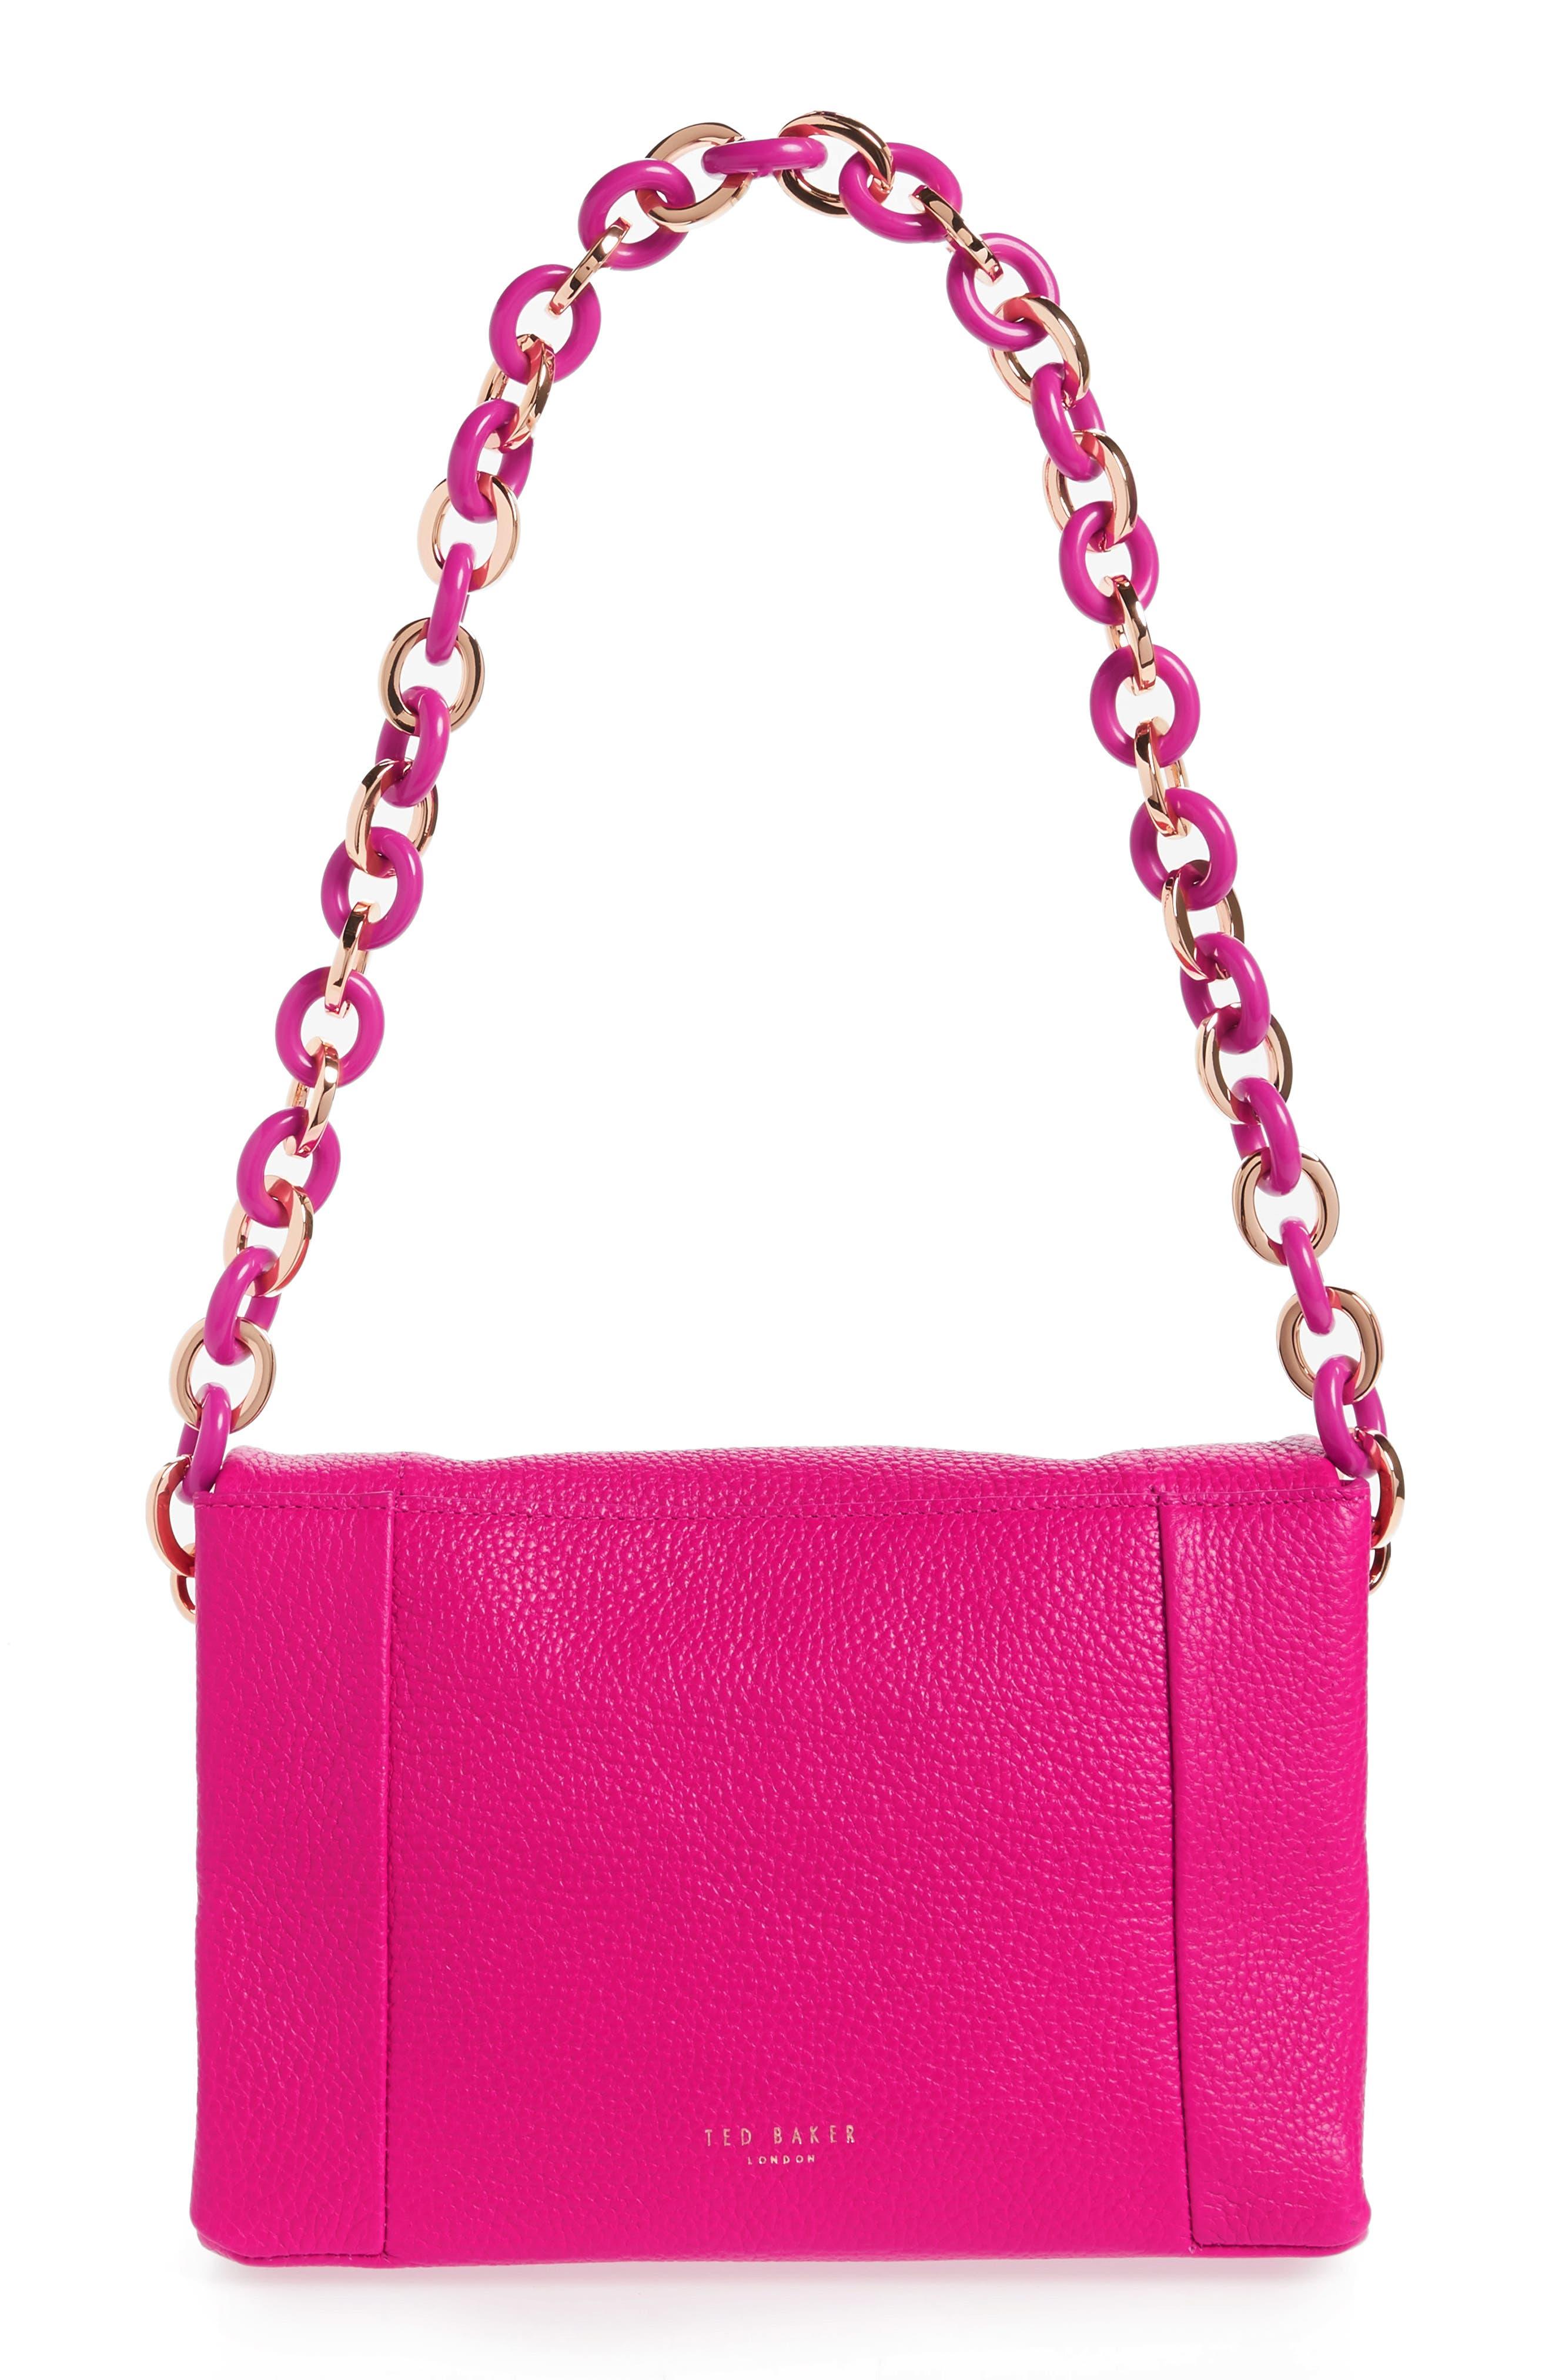 Ipomoea Leather Shoulder Bag,                             Alternate thumbnail 3, color,                             Fuchsia